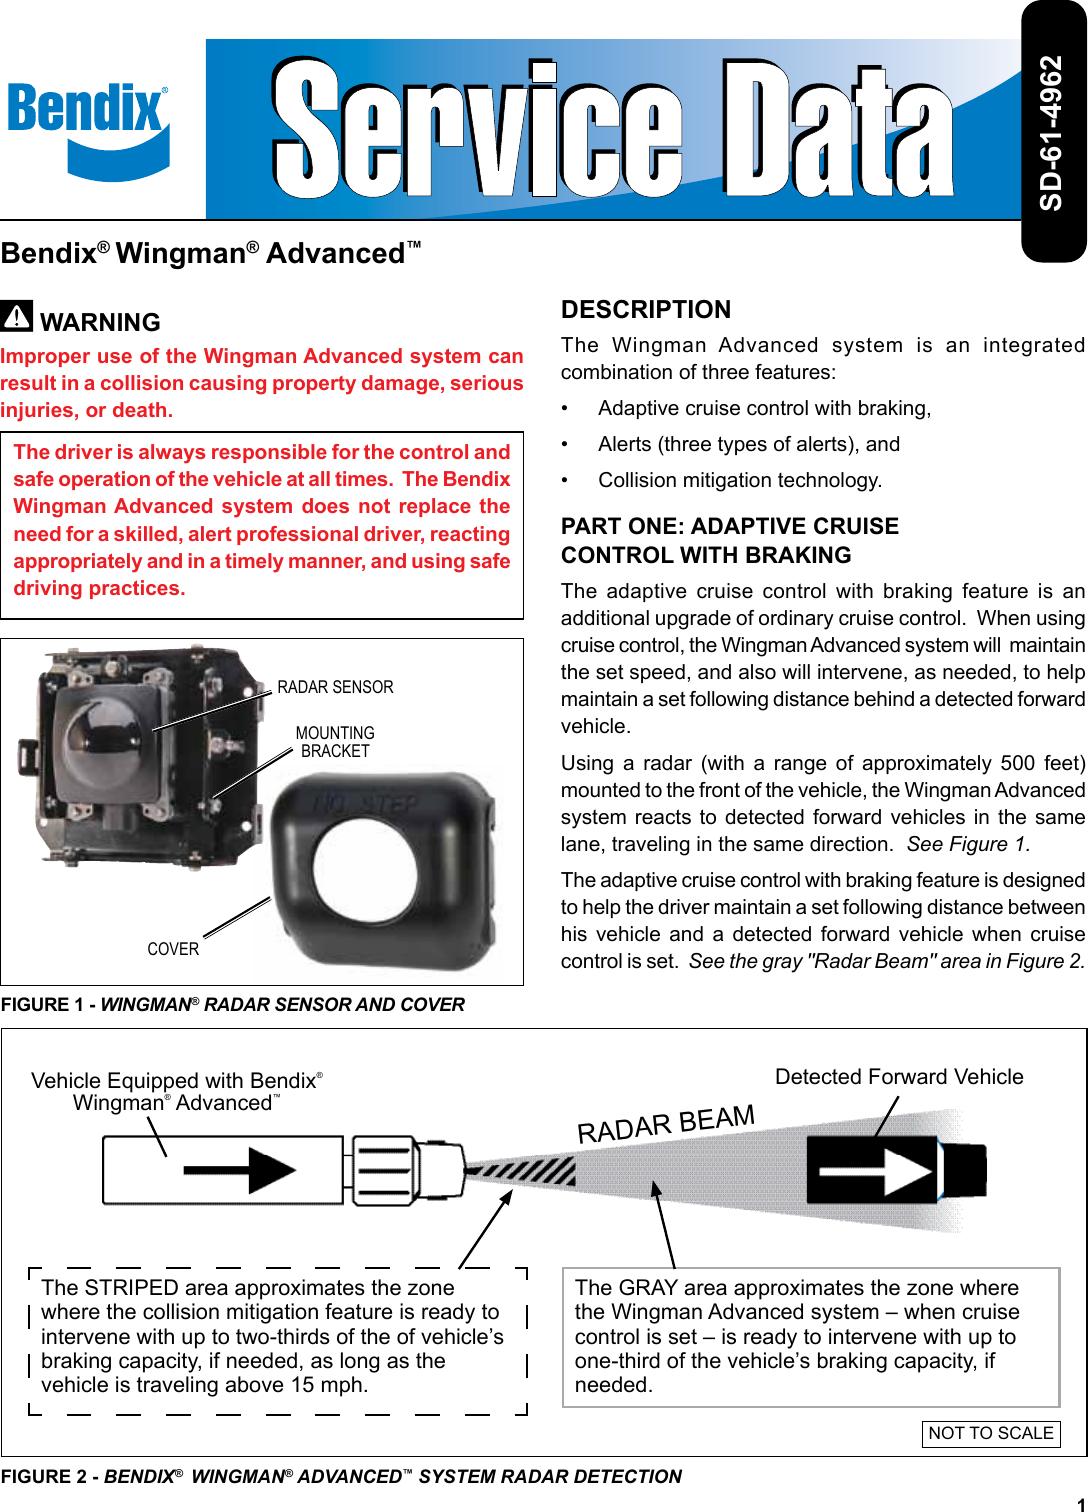 Bendix Bw2852 Users Manual